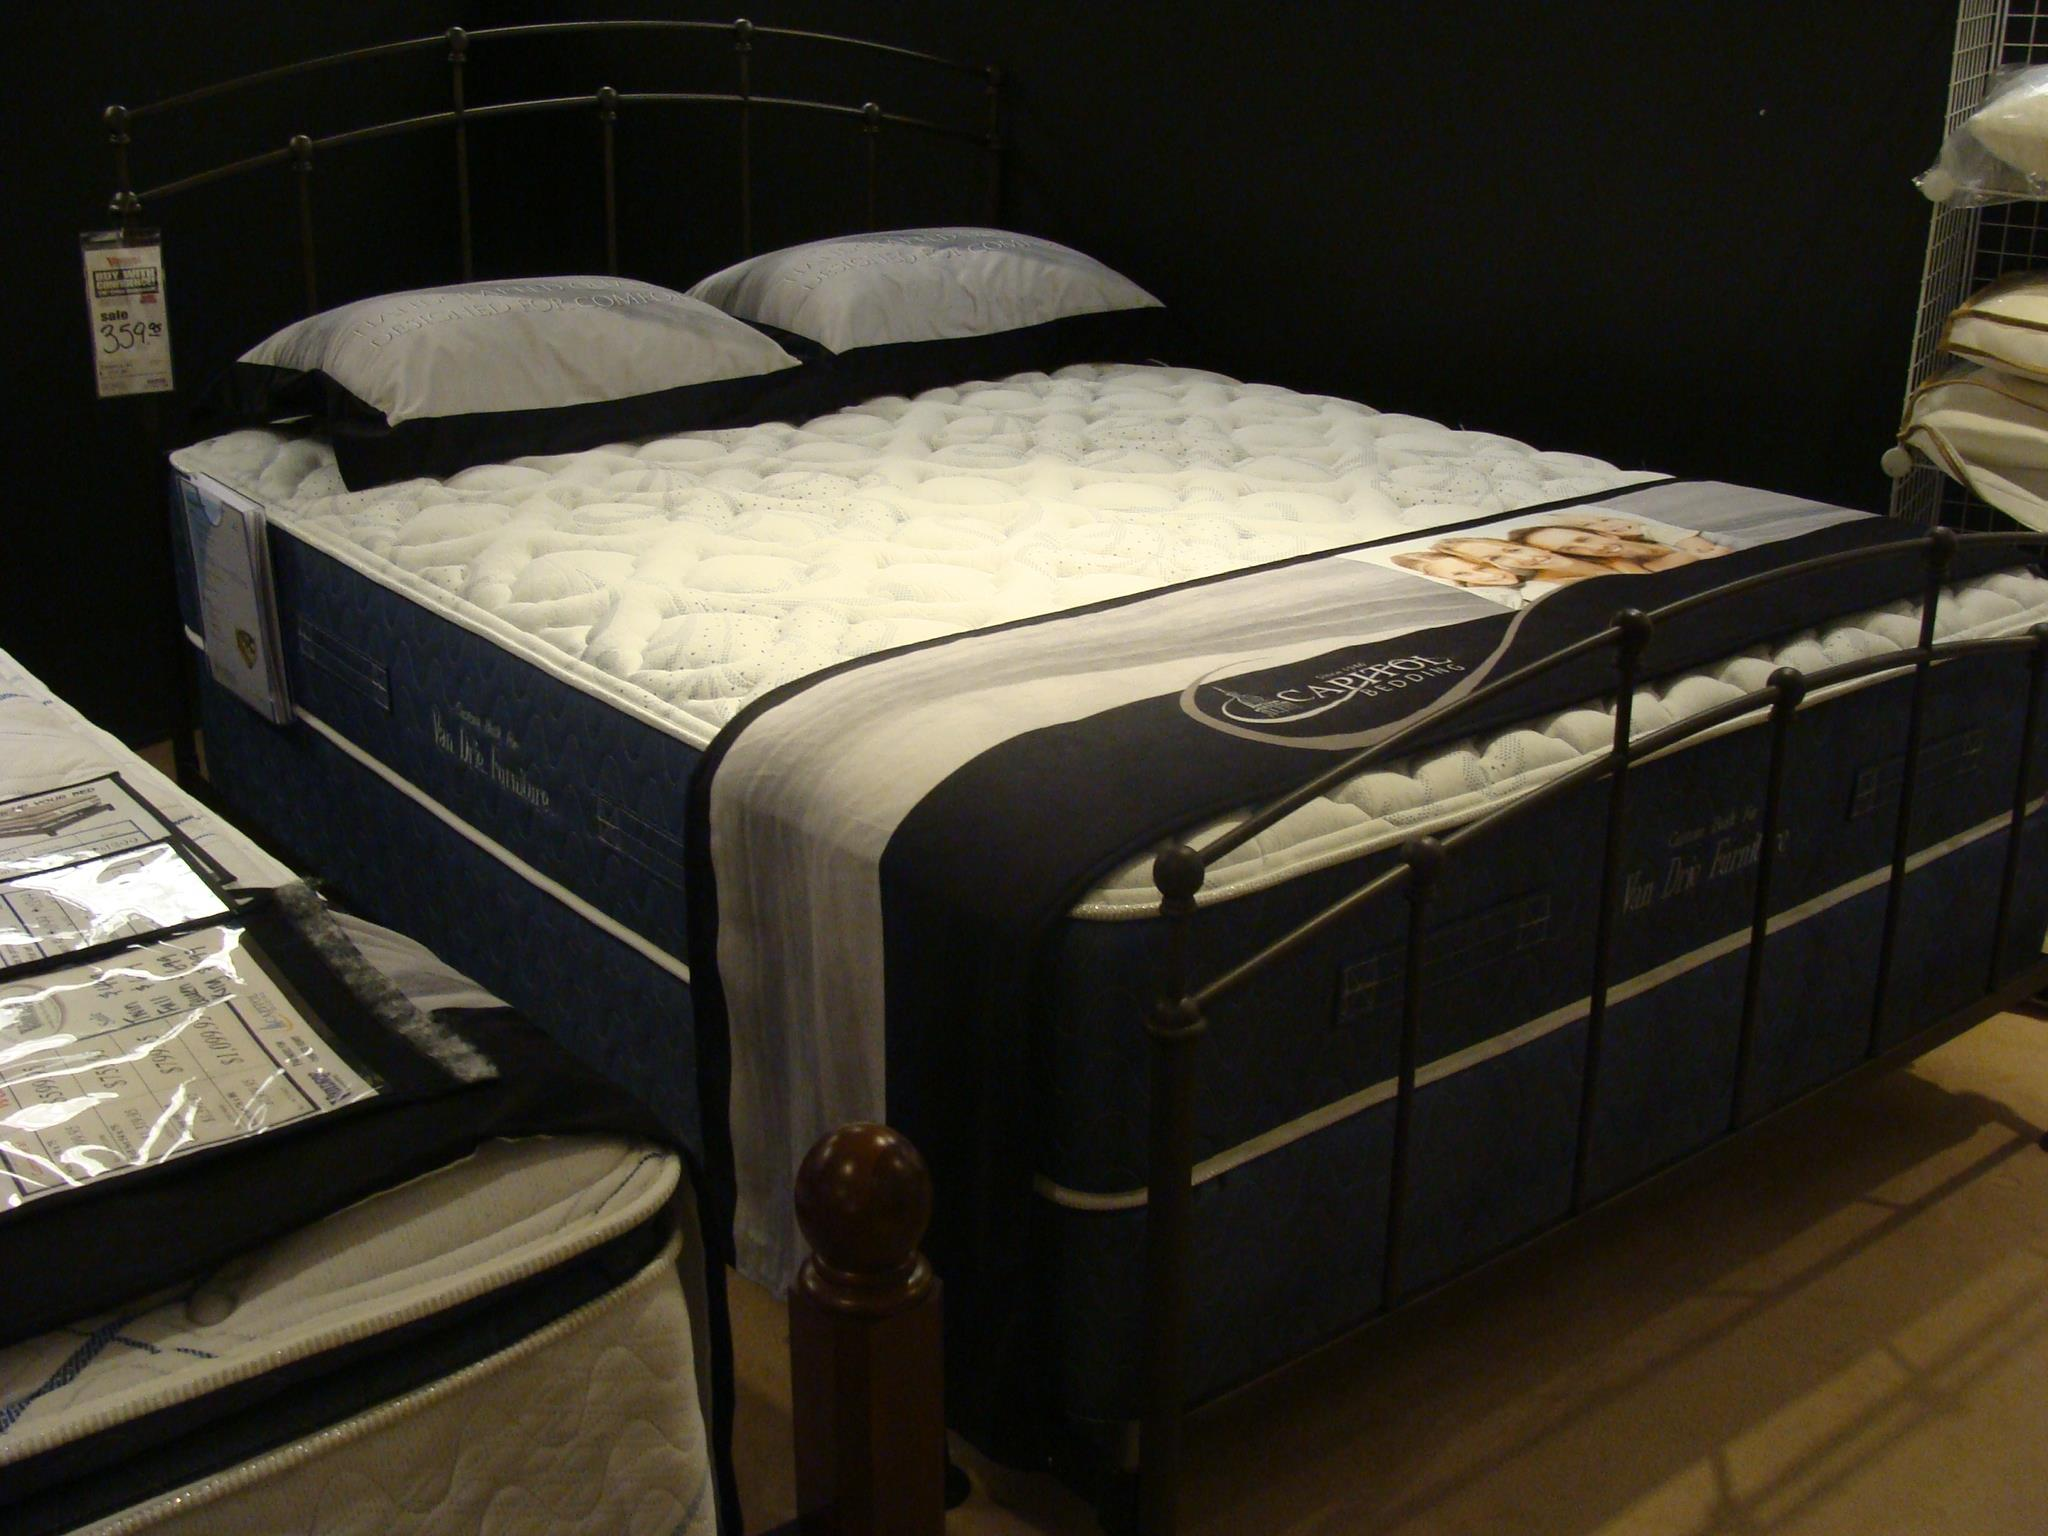 Capitol Bedding Melbourne Firm Full Innerspring Mattress Set - Item Number: Innerspring-F+HMI-F